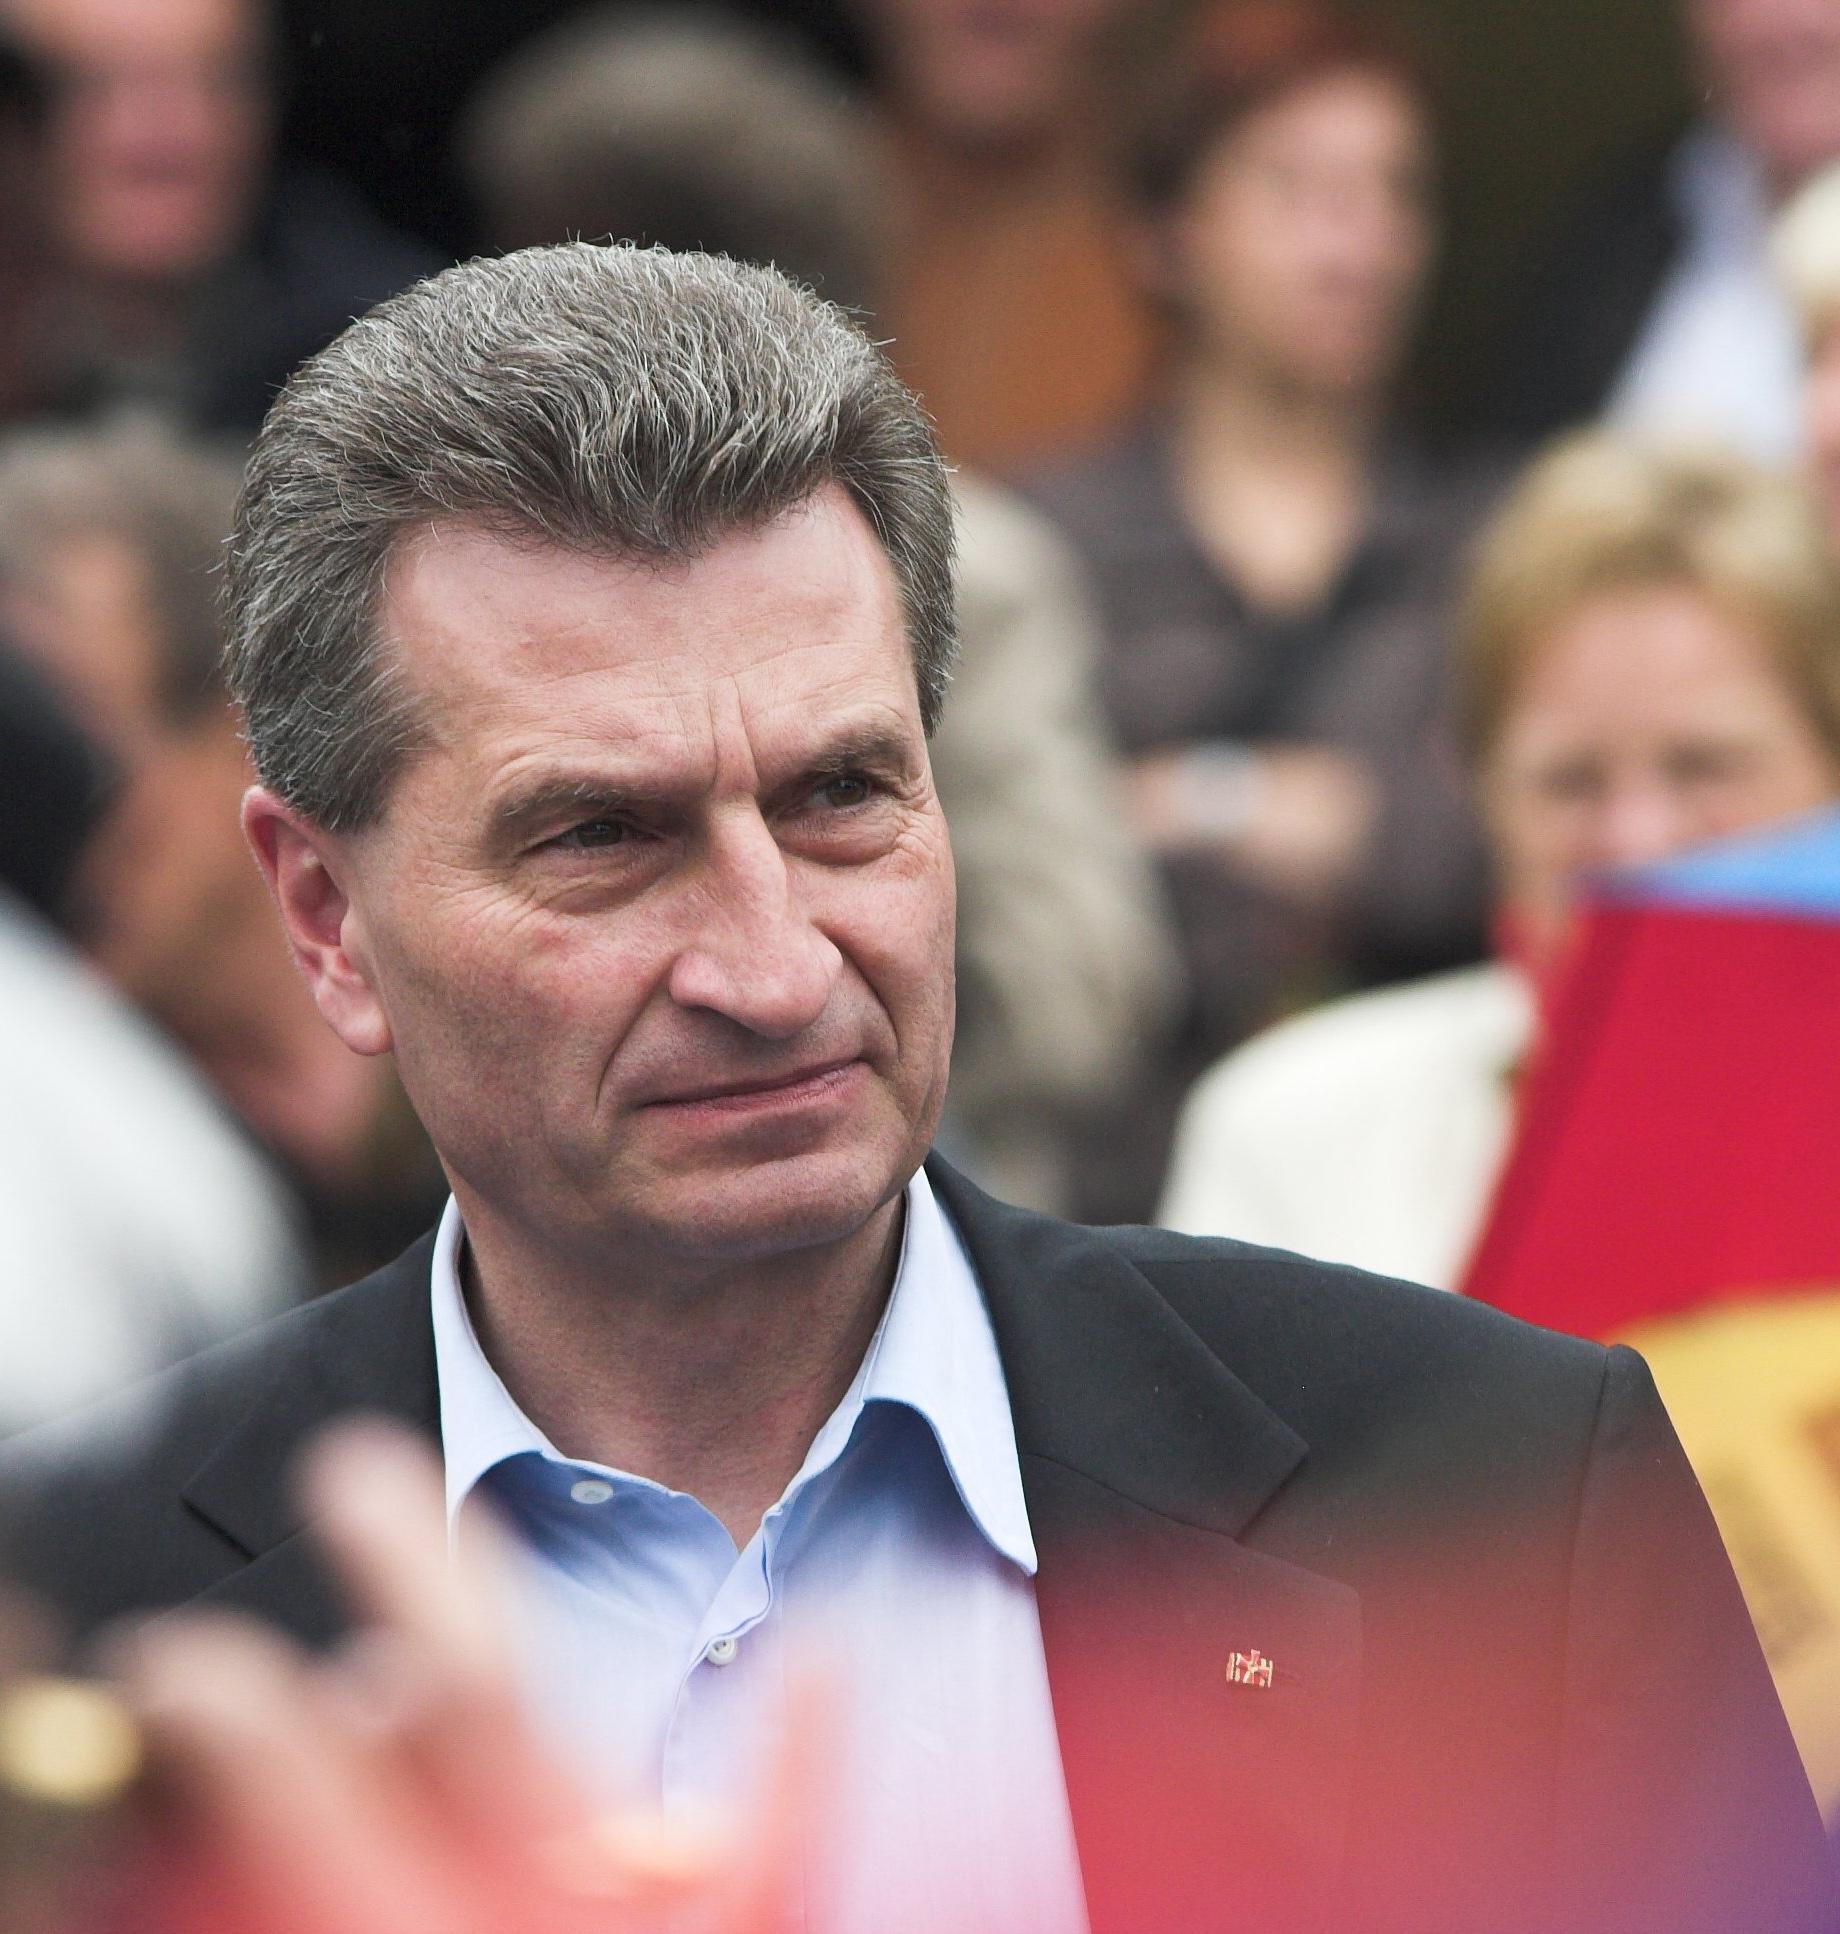 Günther Oettinger Größe